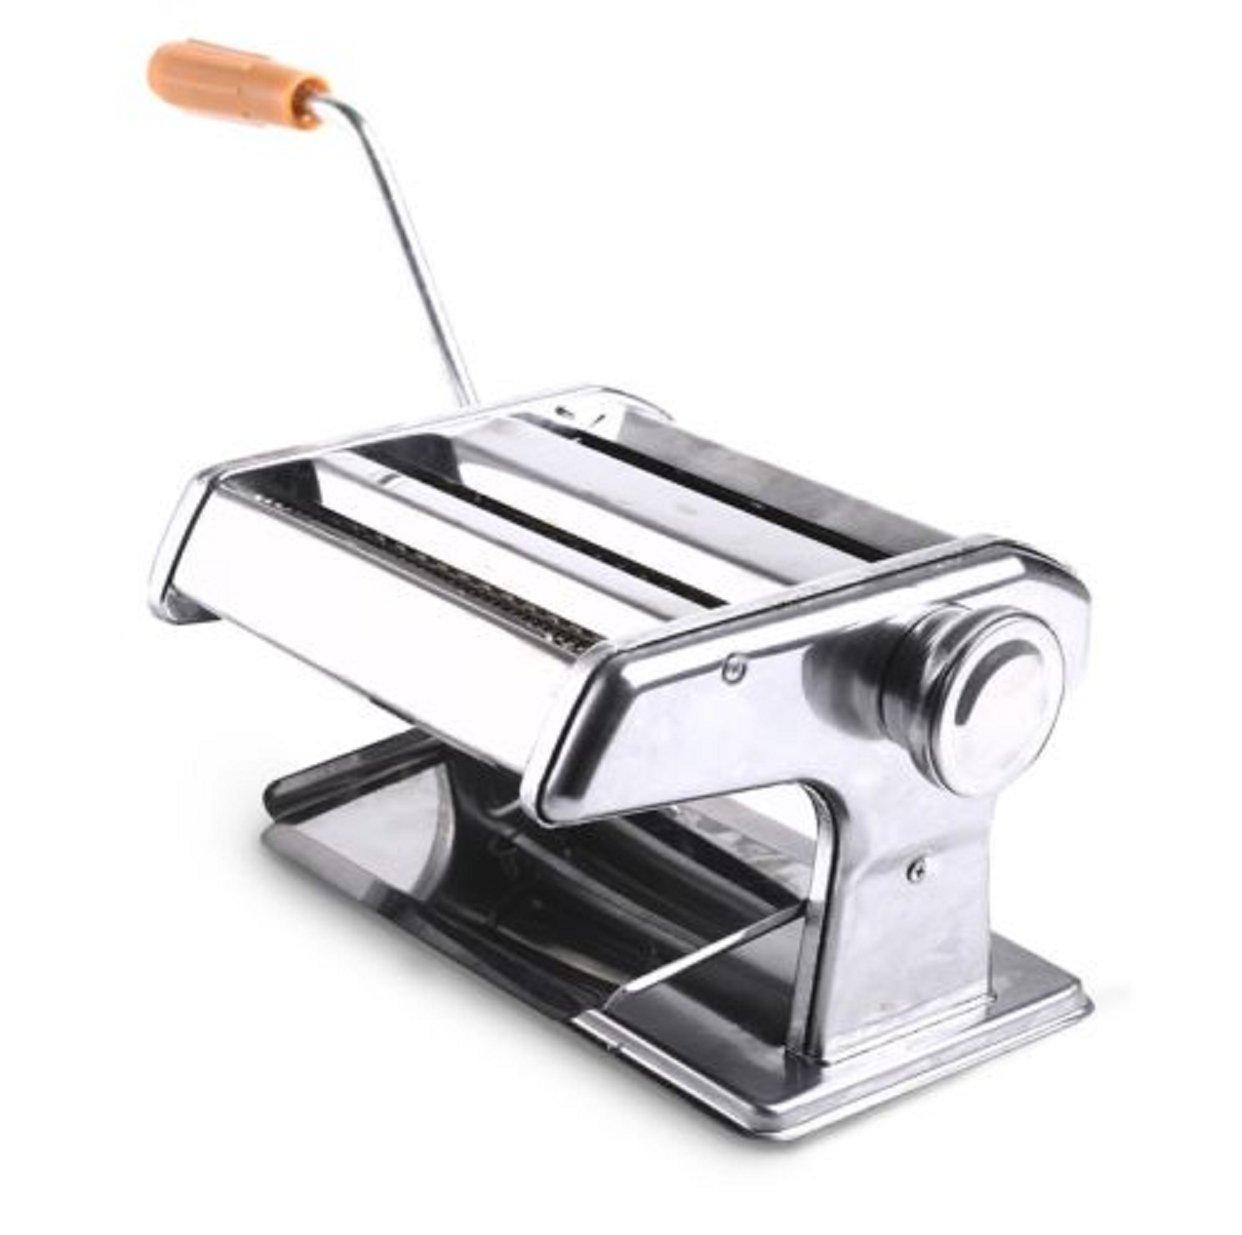 "Portable Pasta Maker Roller 150mm 6"" Health Machine 50mm & Noodle Spaghetti and Fettuccine"